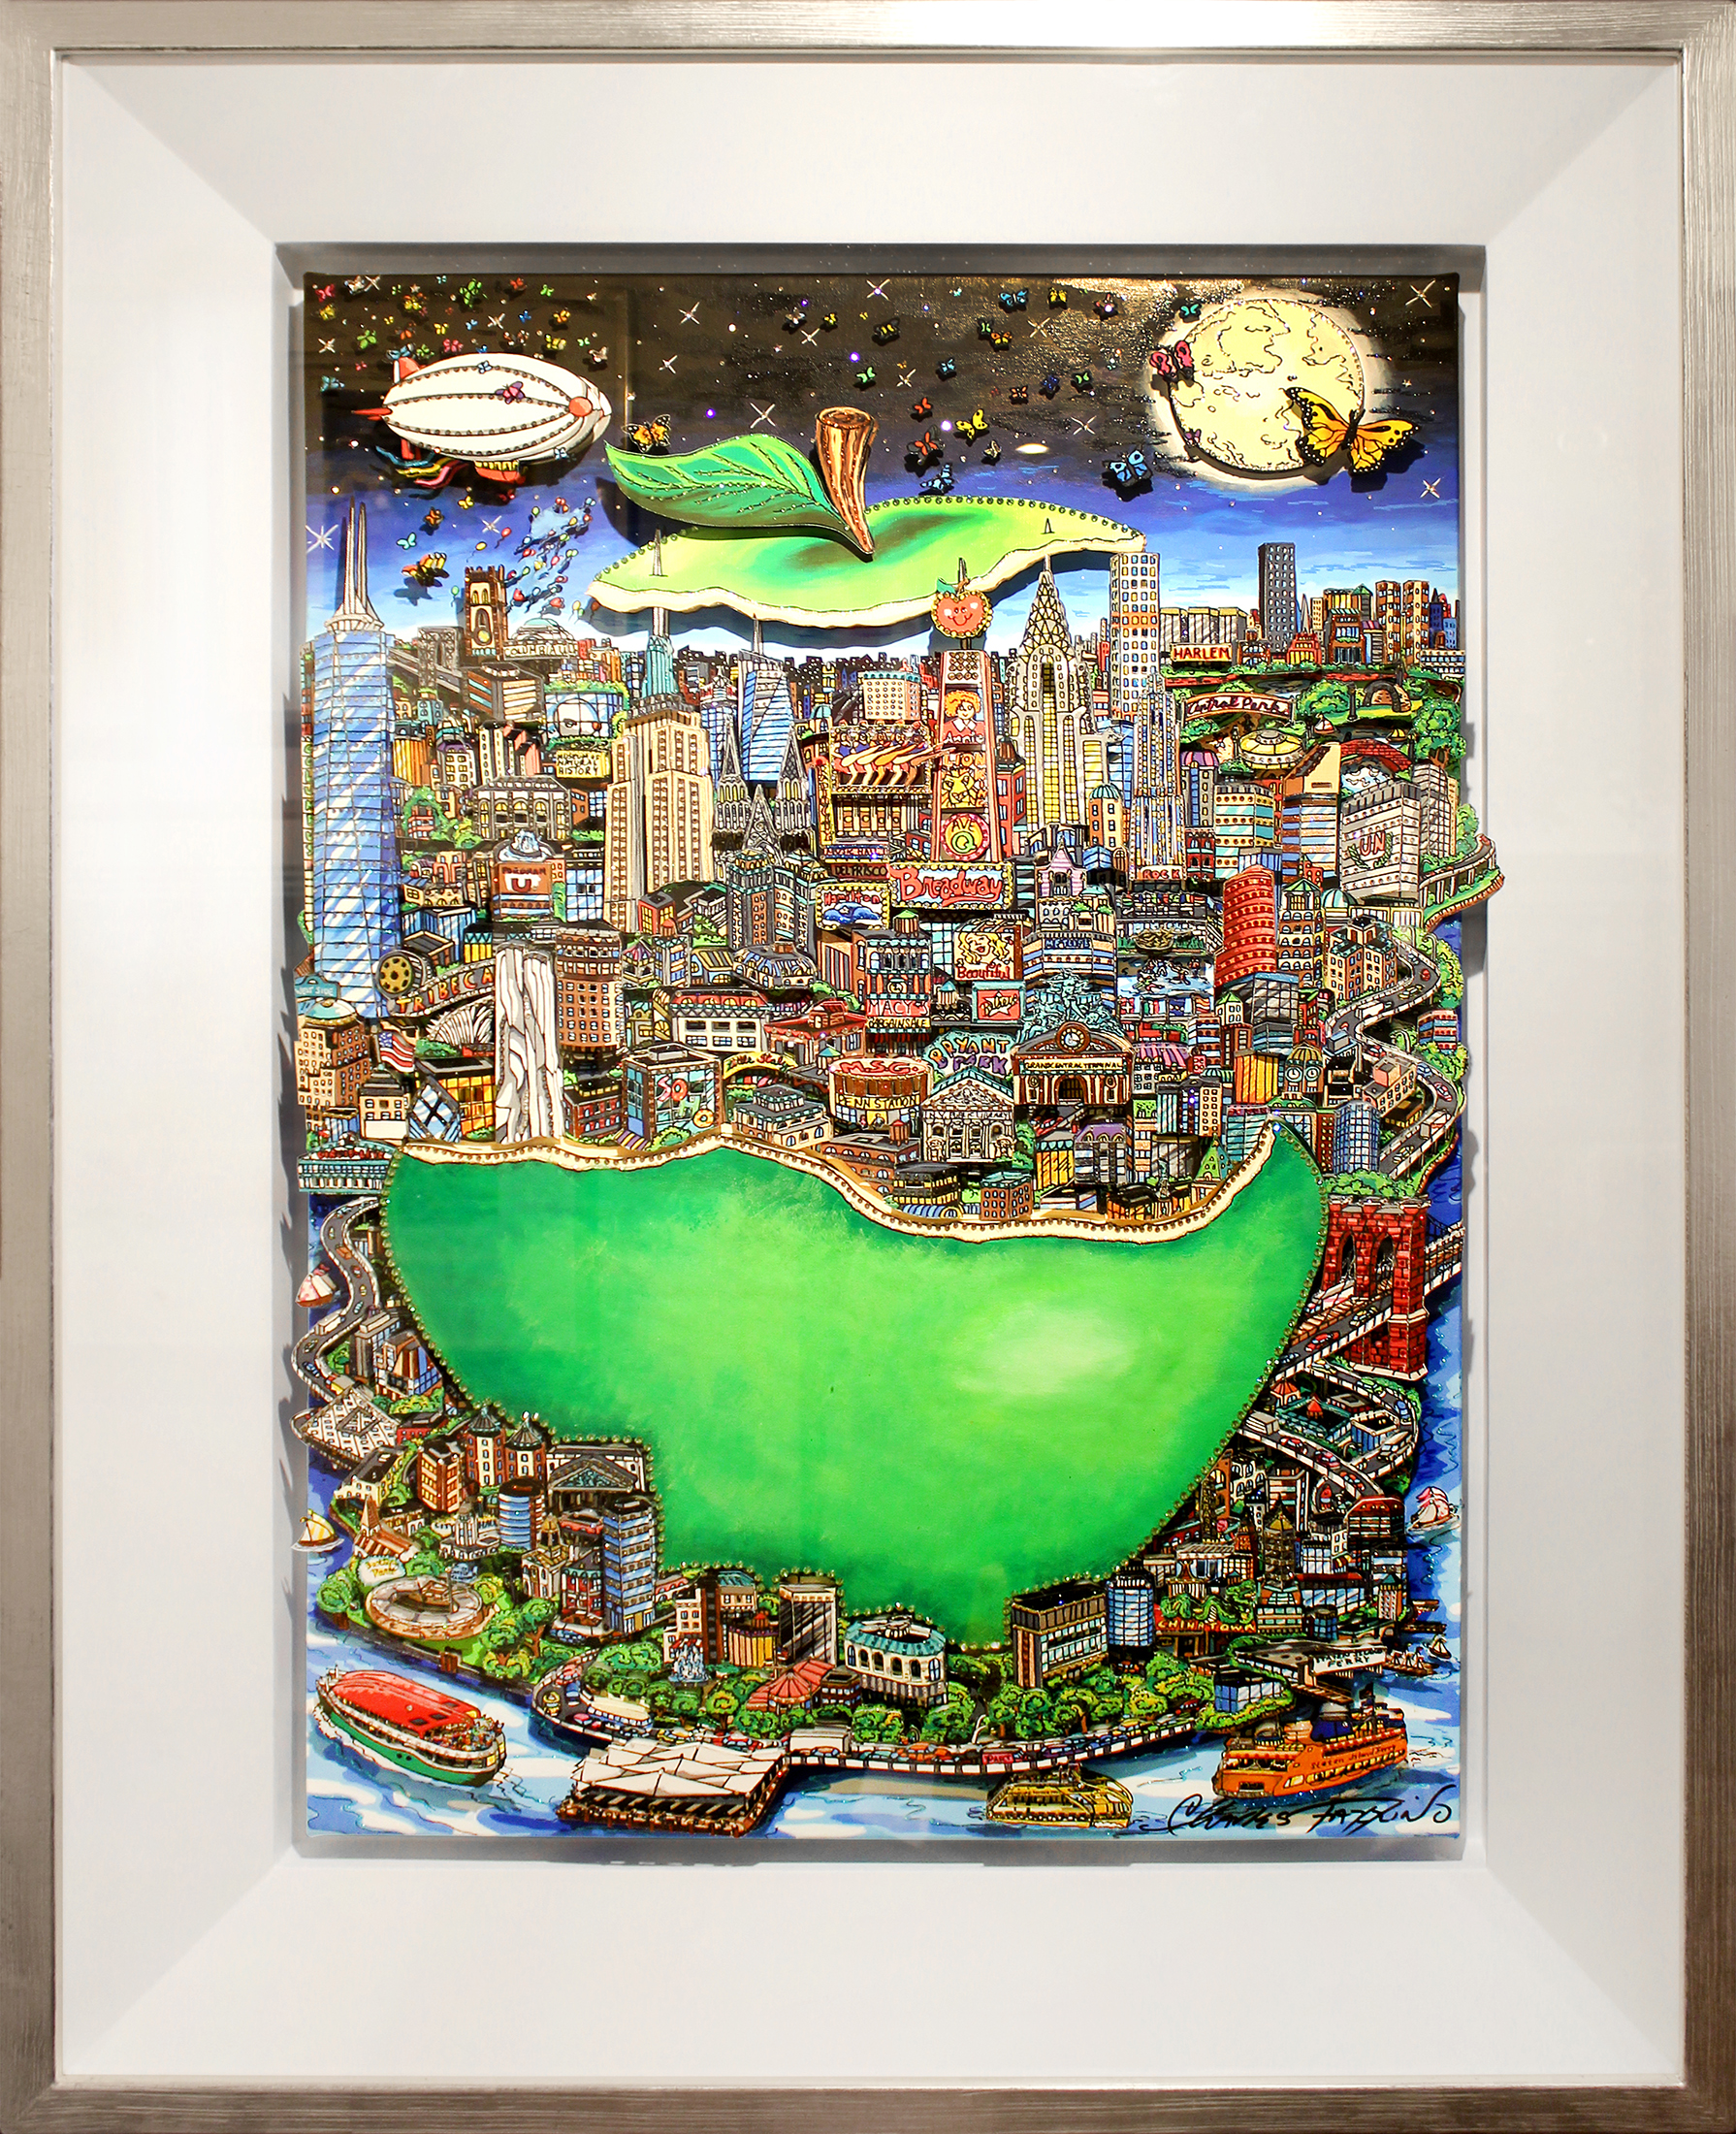 Charles Fazzino - Green Apple II , 5553-012-016